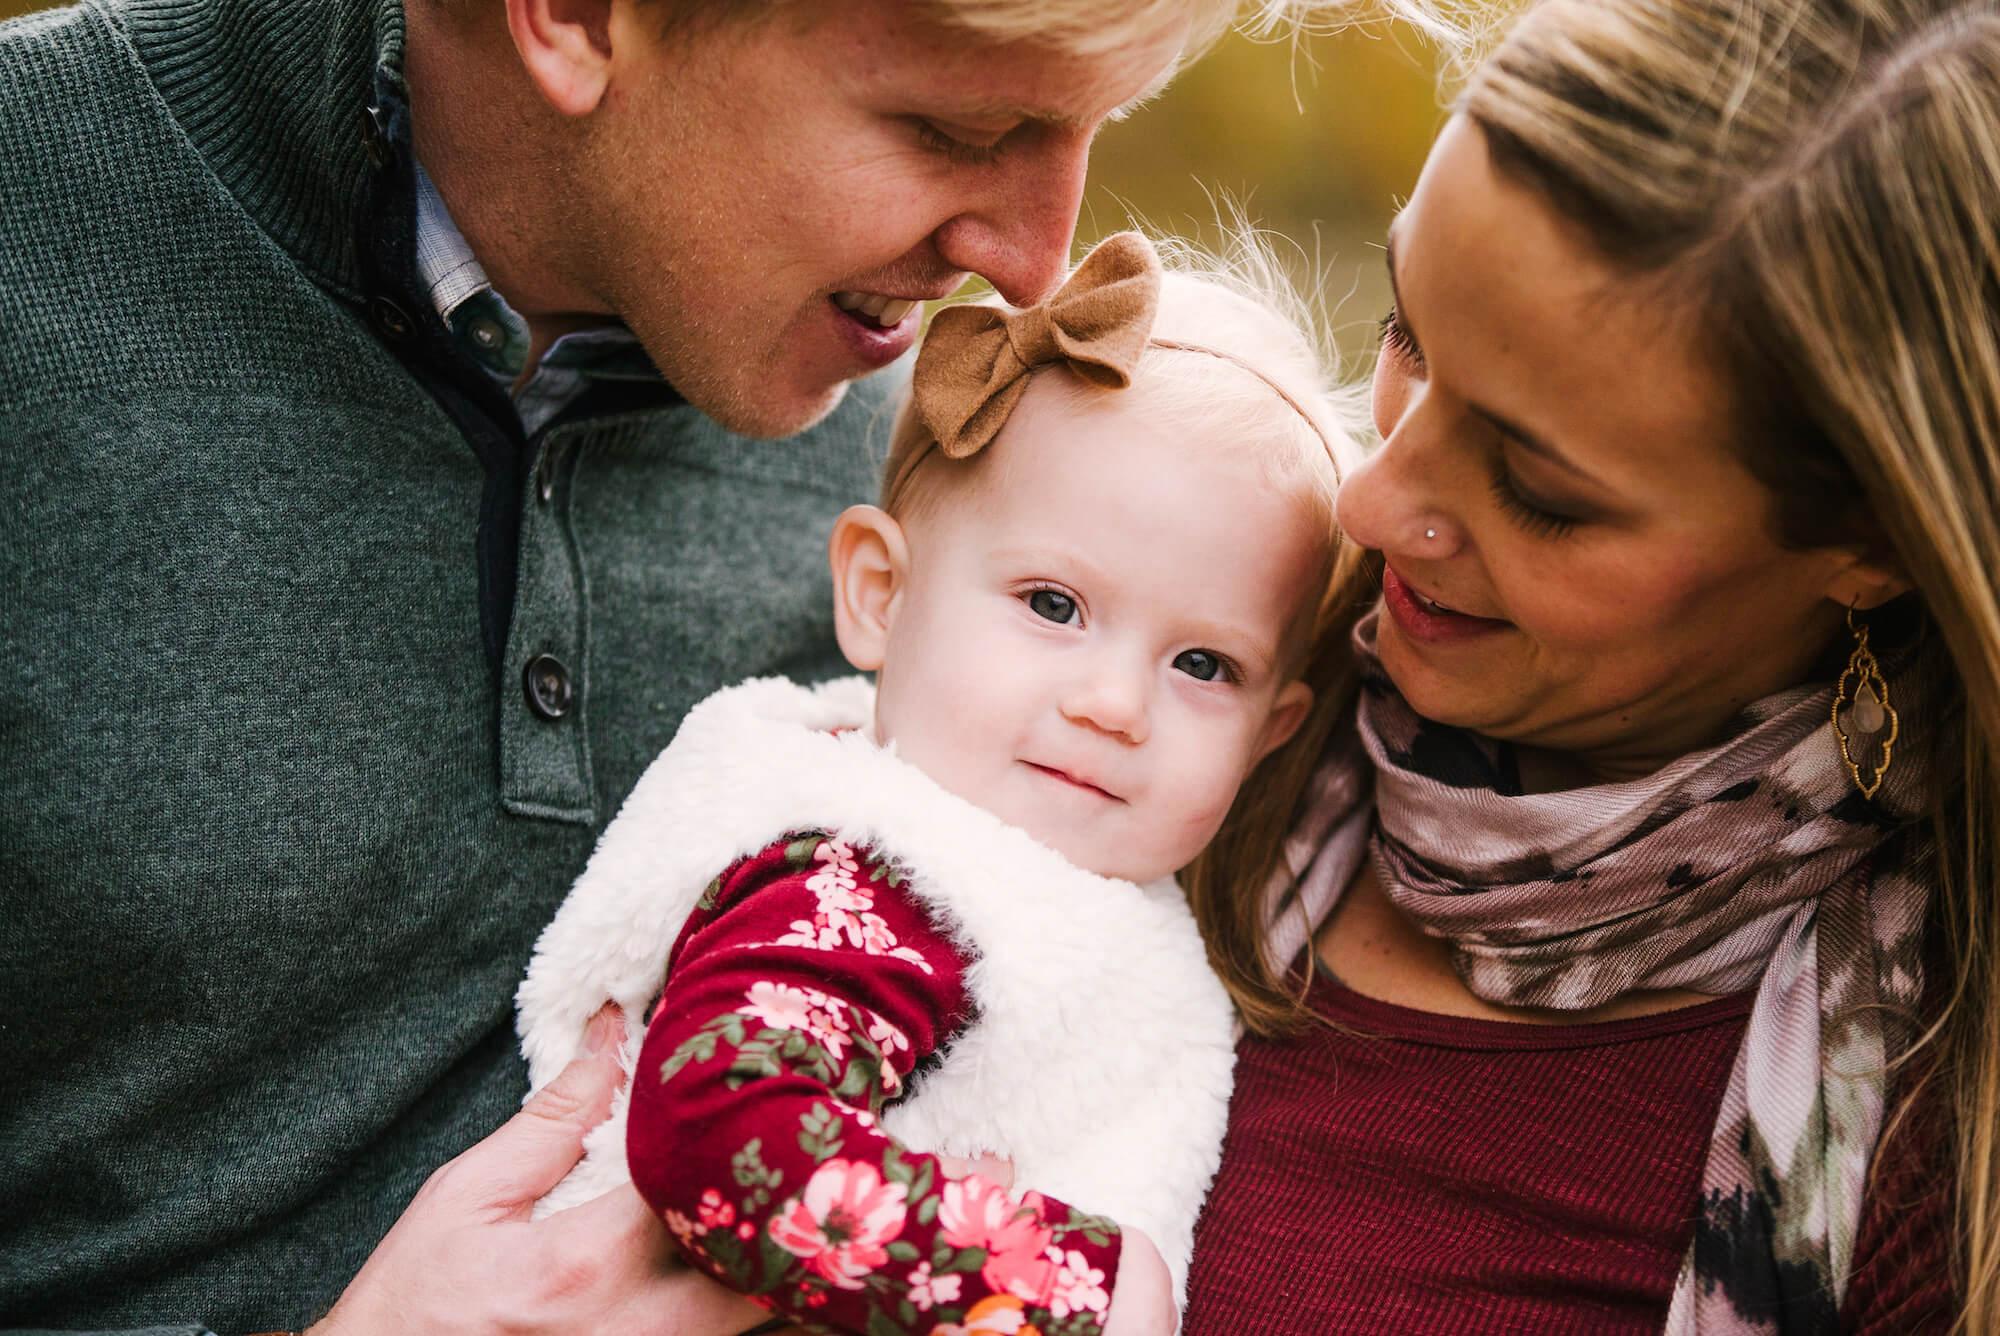 engle-olson-family-photography-session-13.jpg